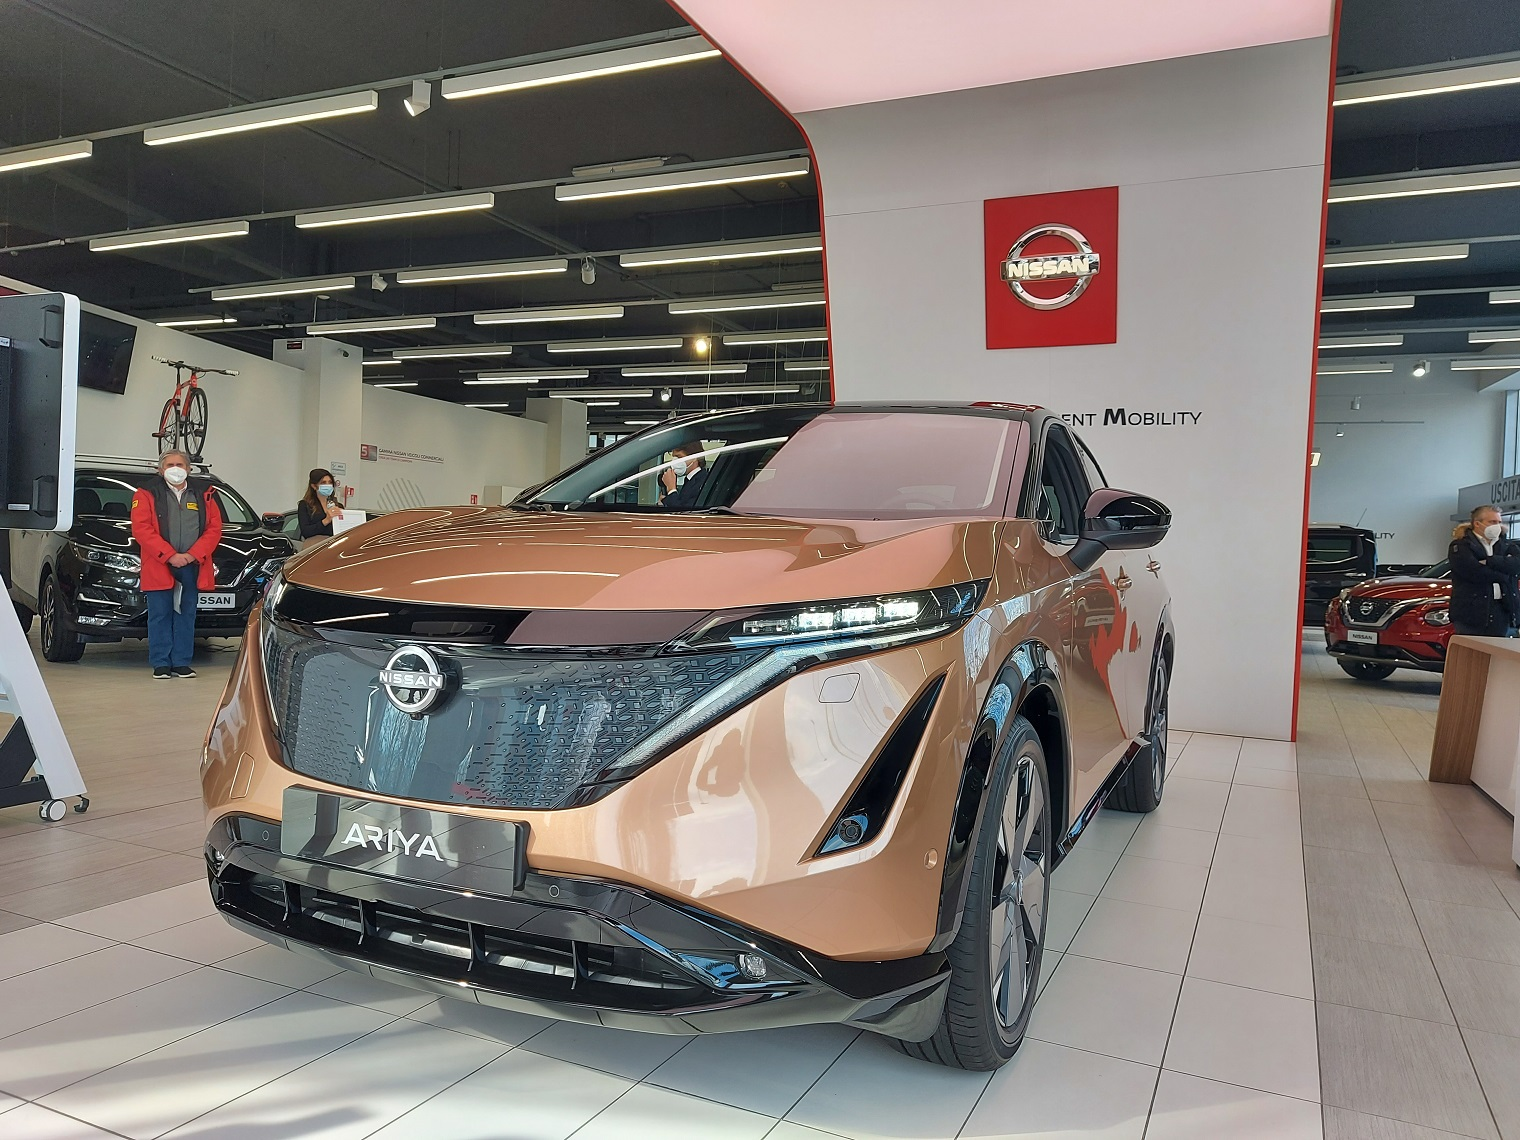 nuova Nissan Ariya 2021